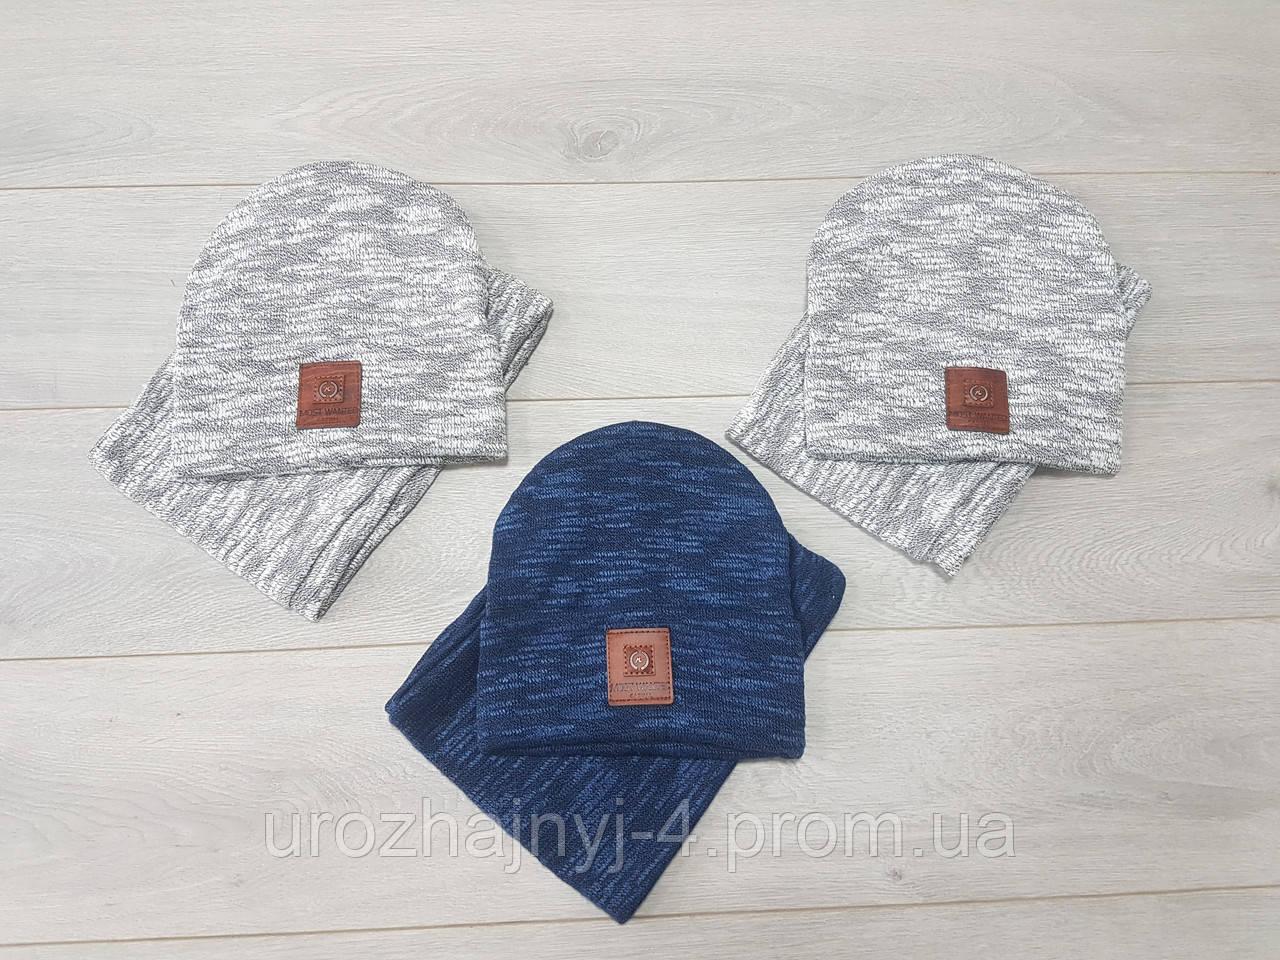 Трикотажный набор шапка и хомут р48-50 подкладк х/б